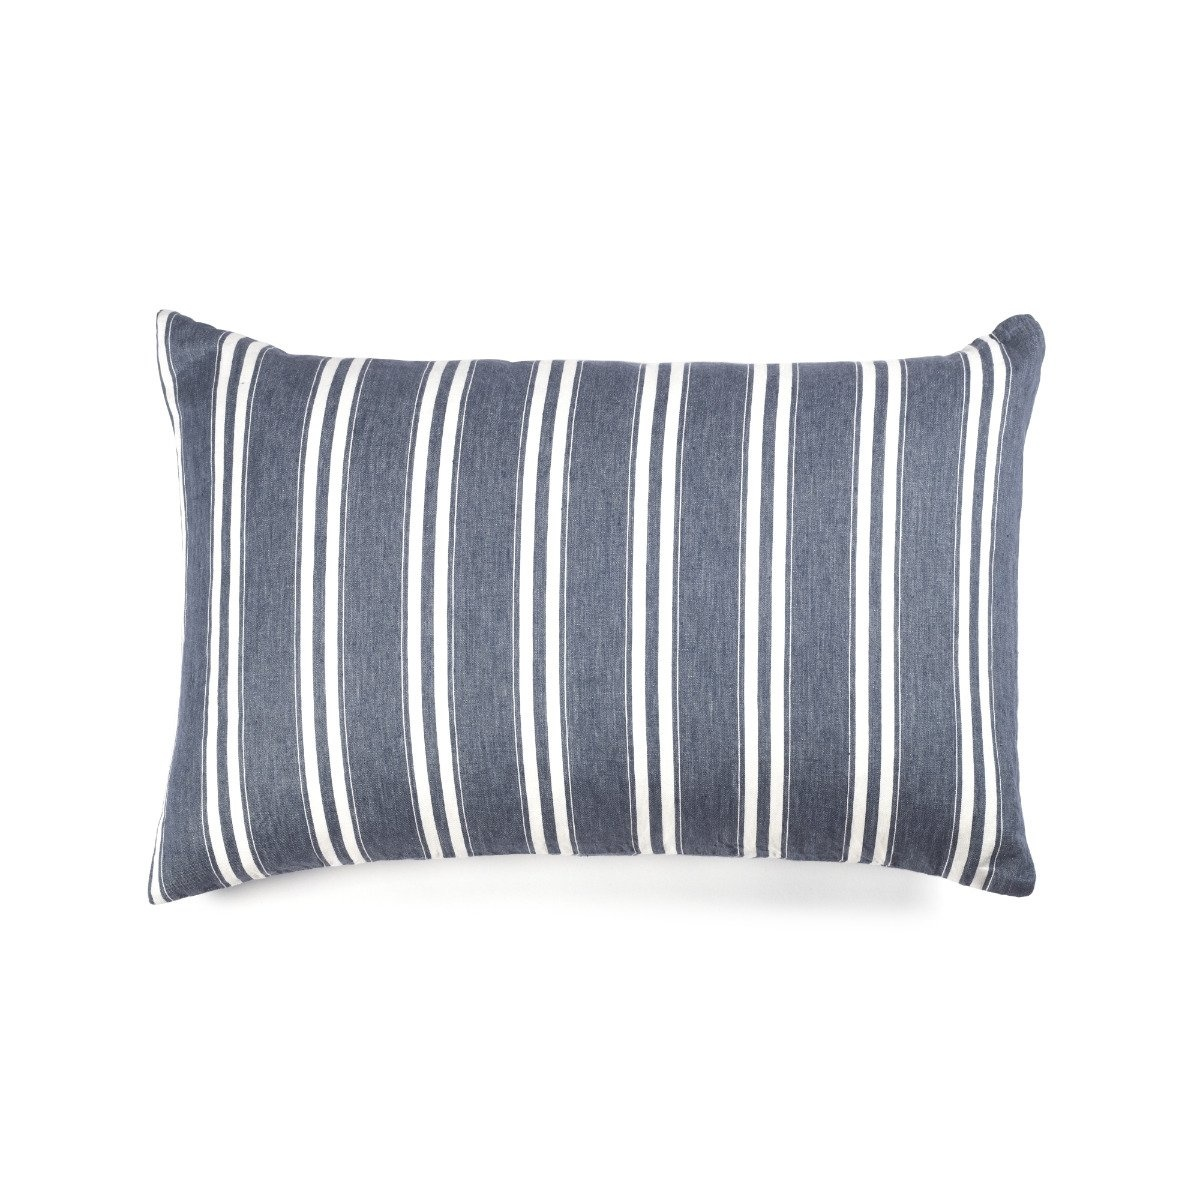 Pillowcase - Folkestone-1